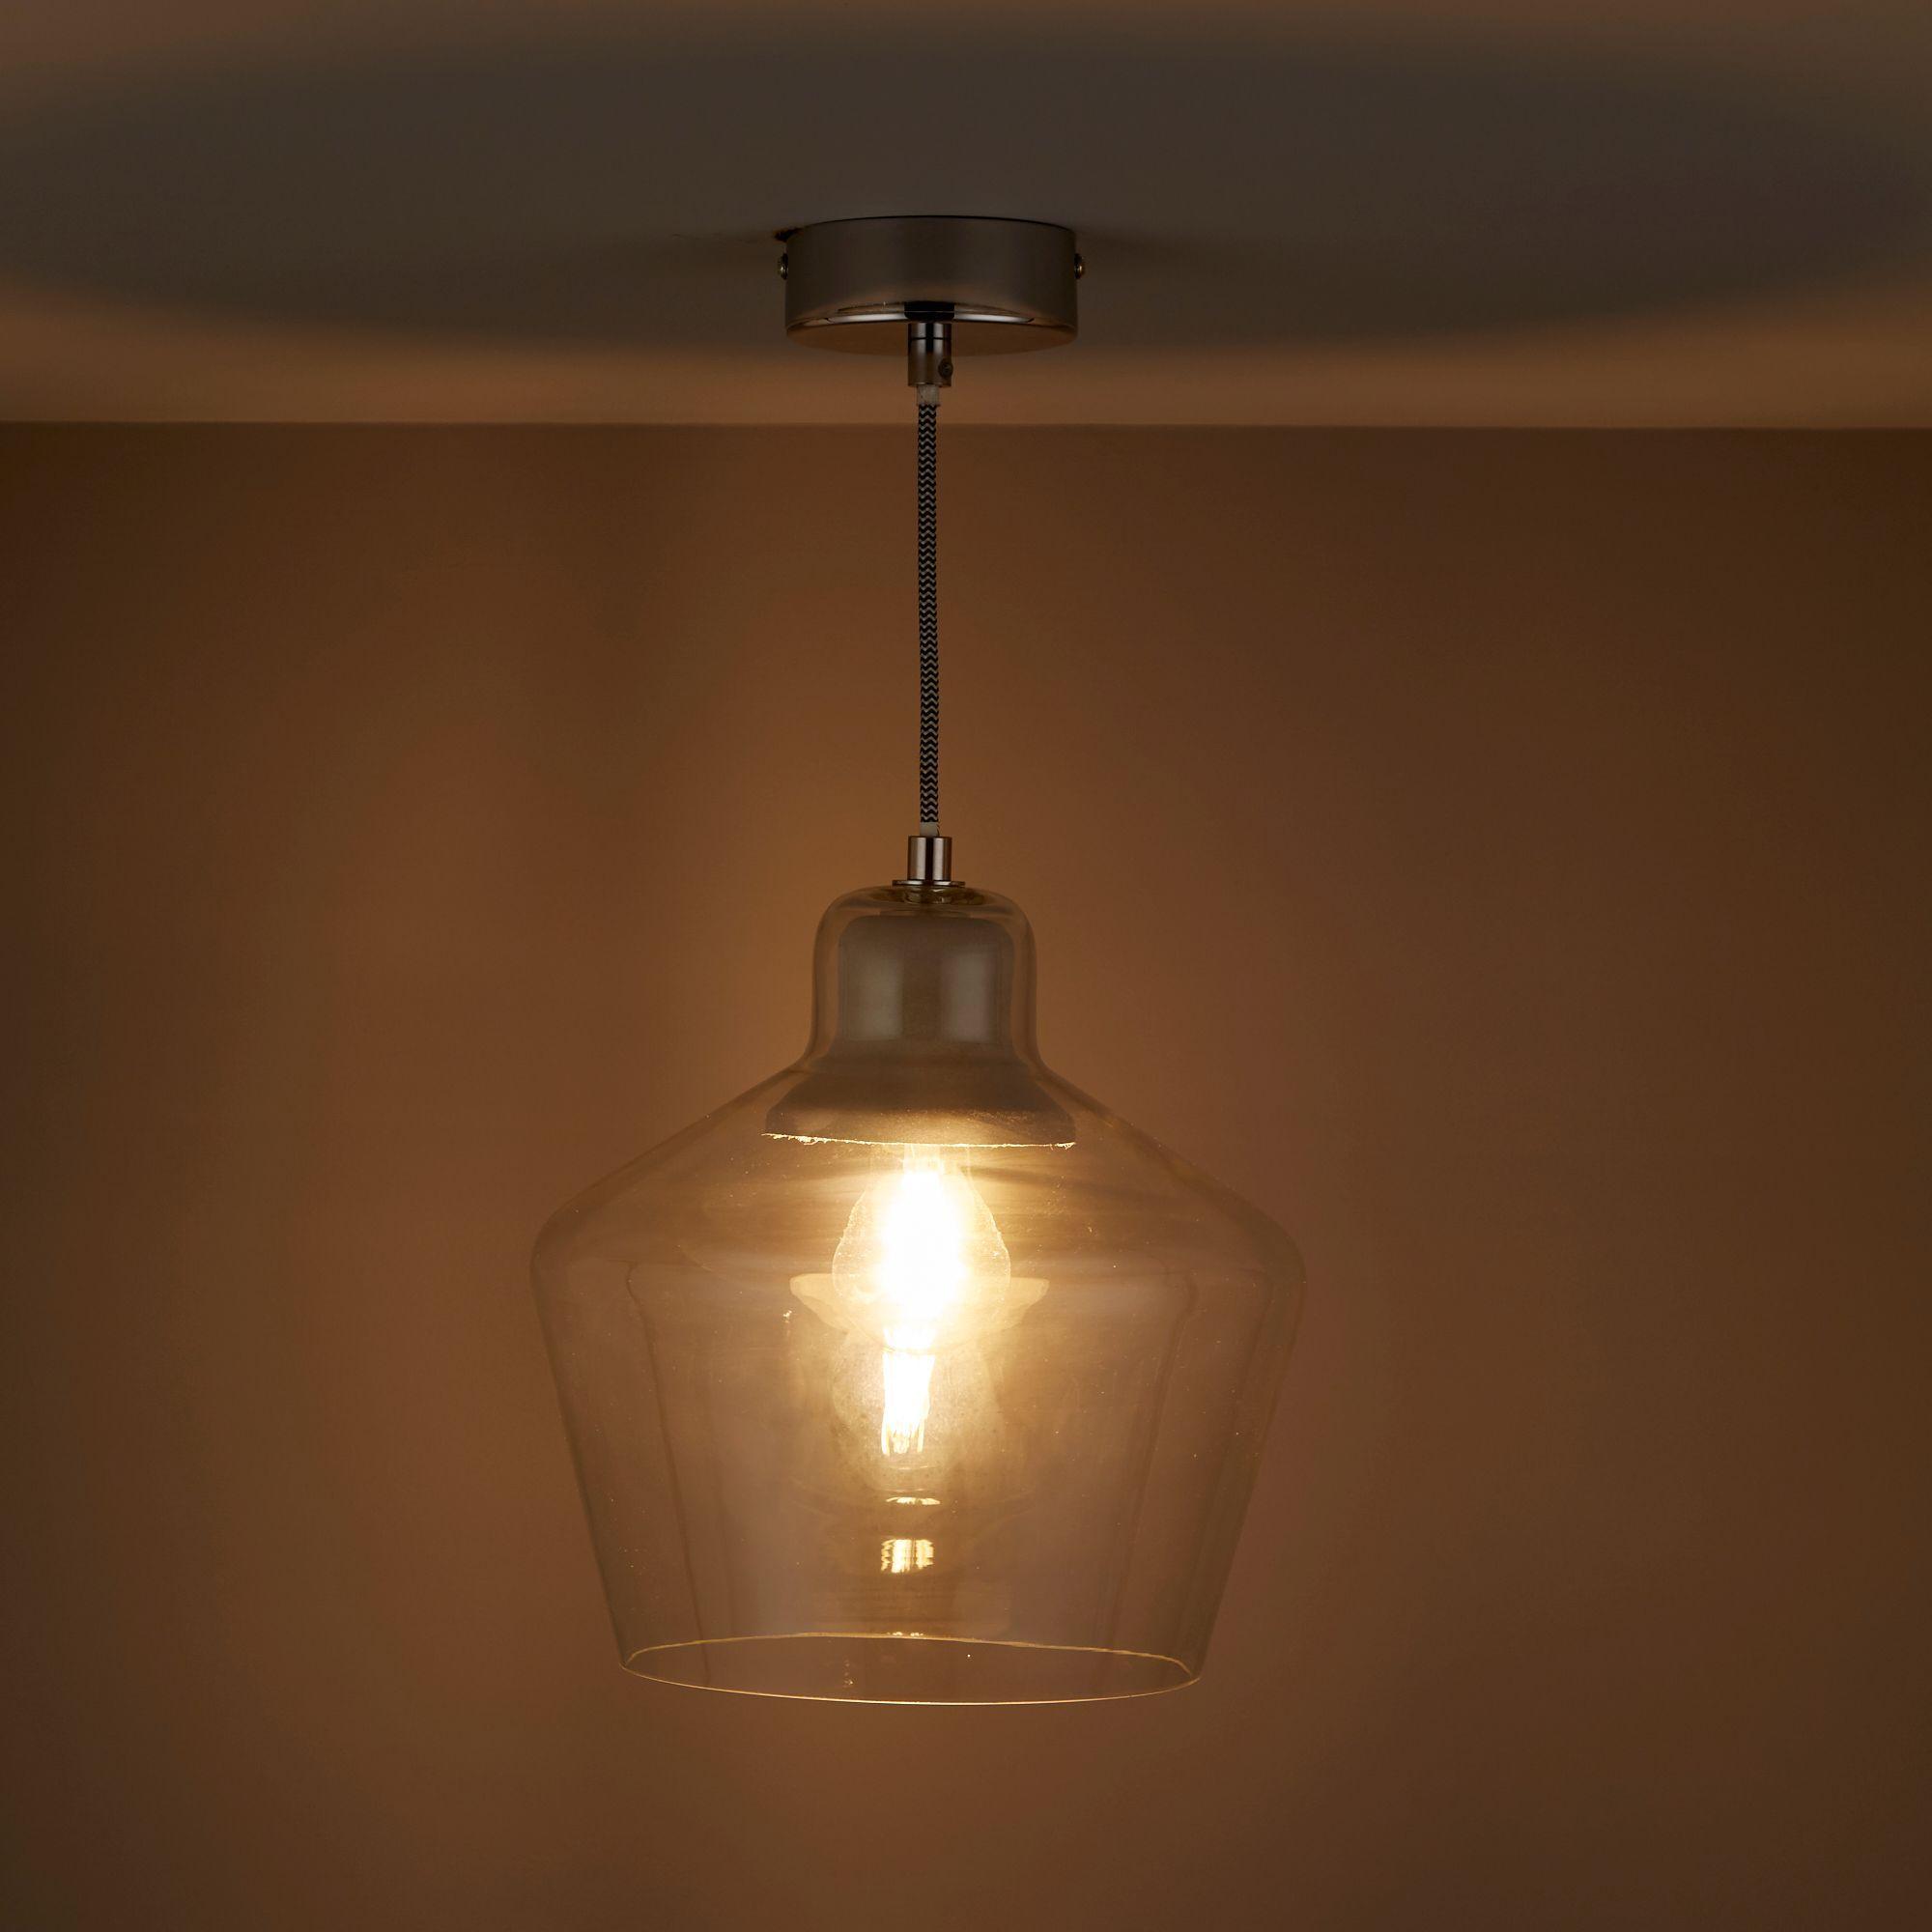 diy ceiling lighting. Jidda Clear Pendant Ceiling Light - Large Diy Lighting